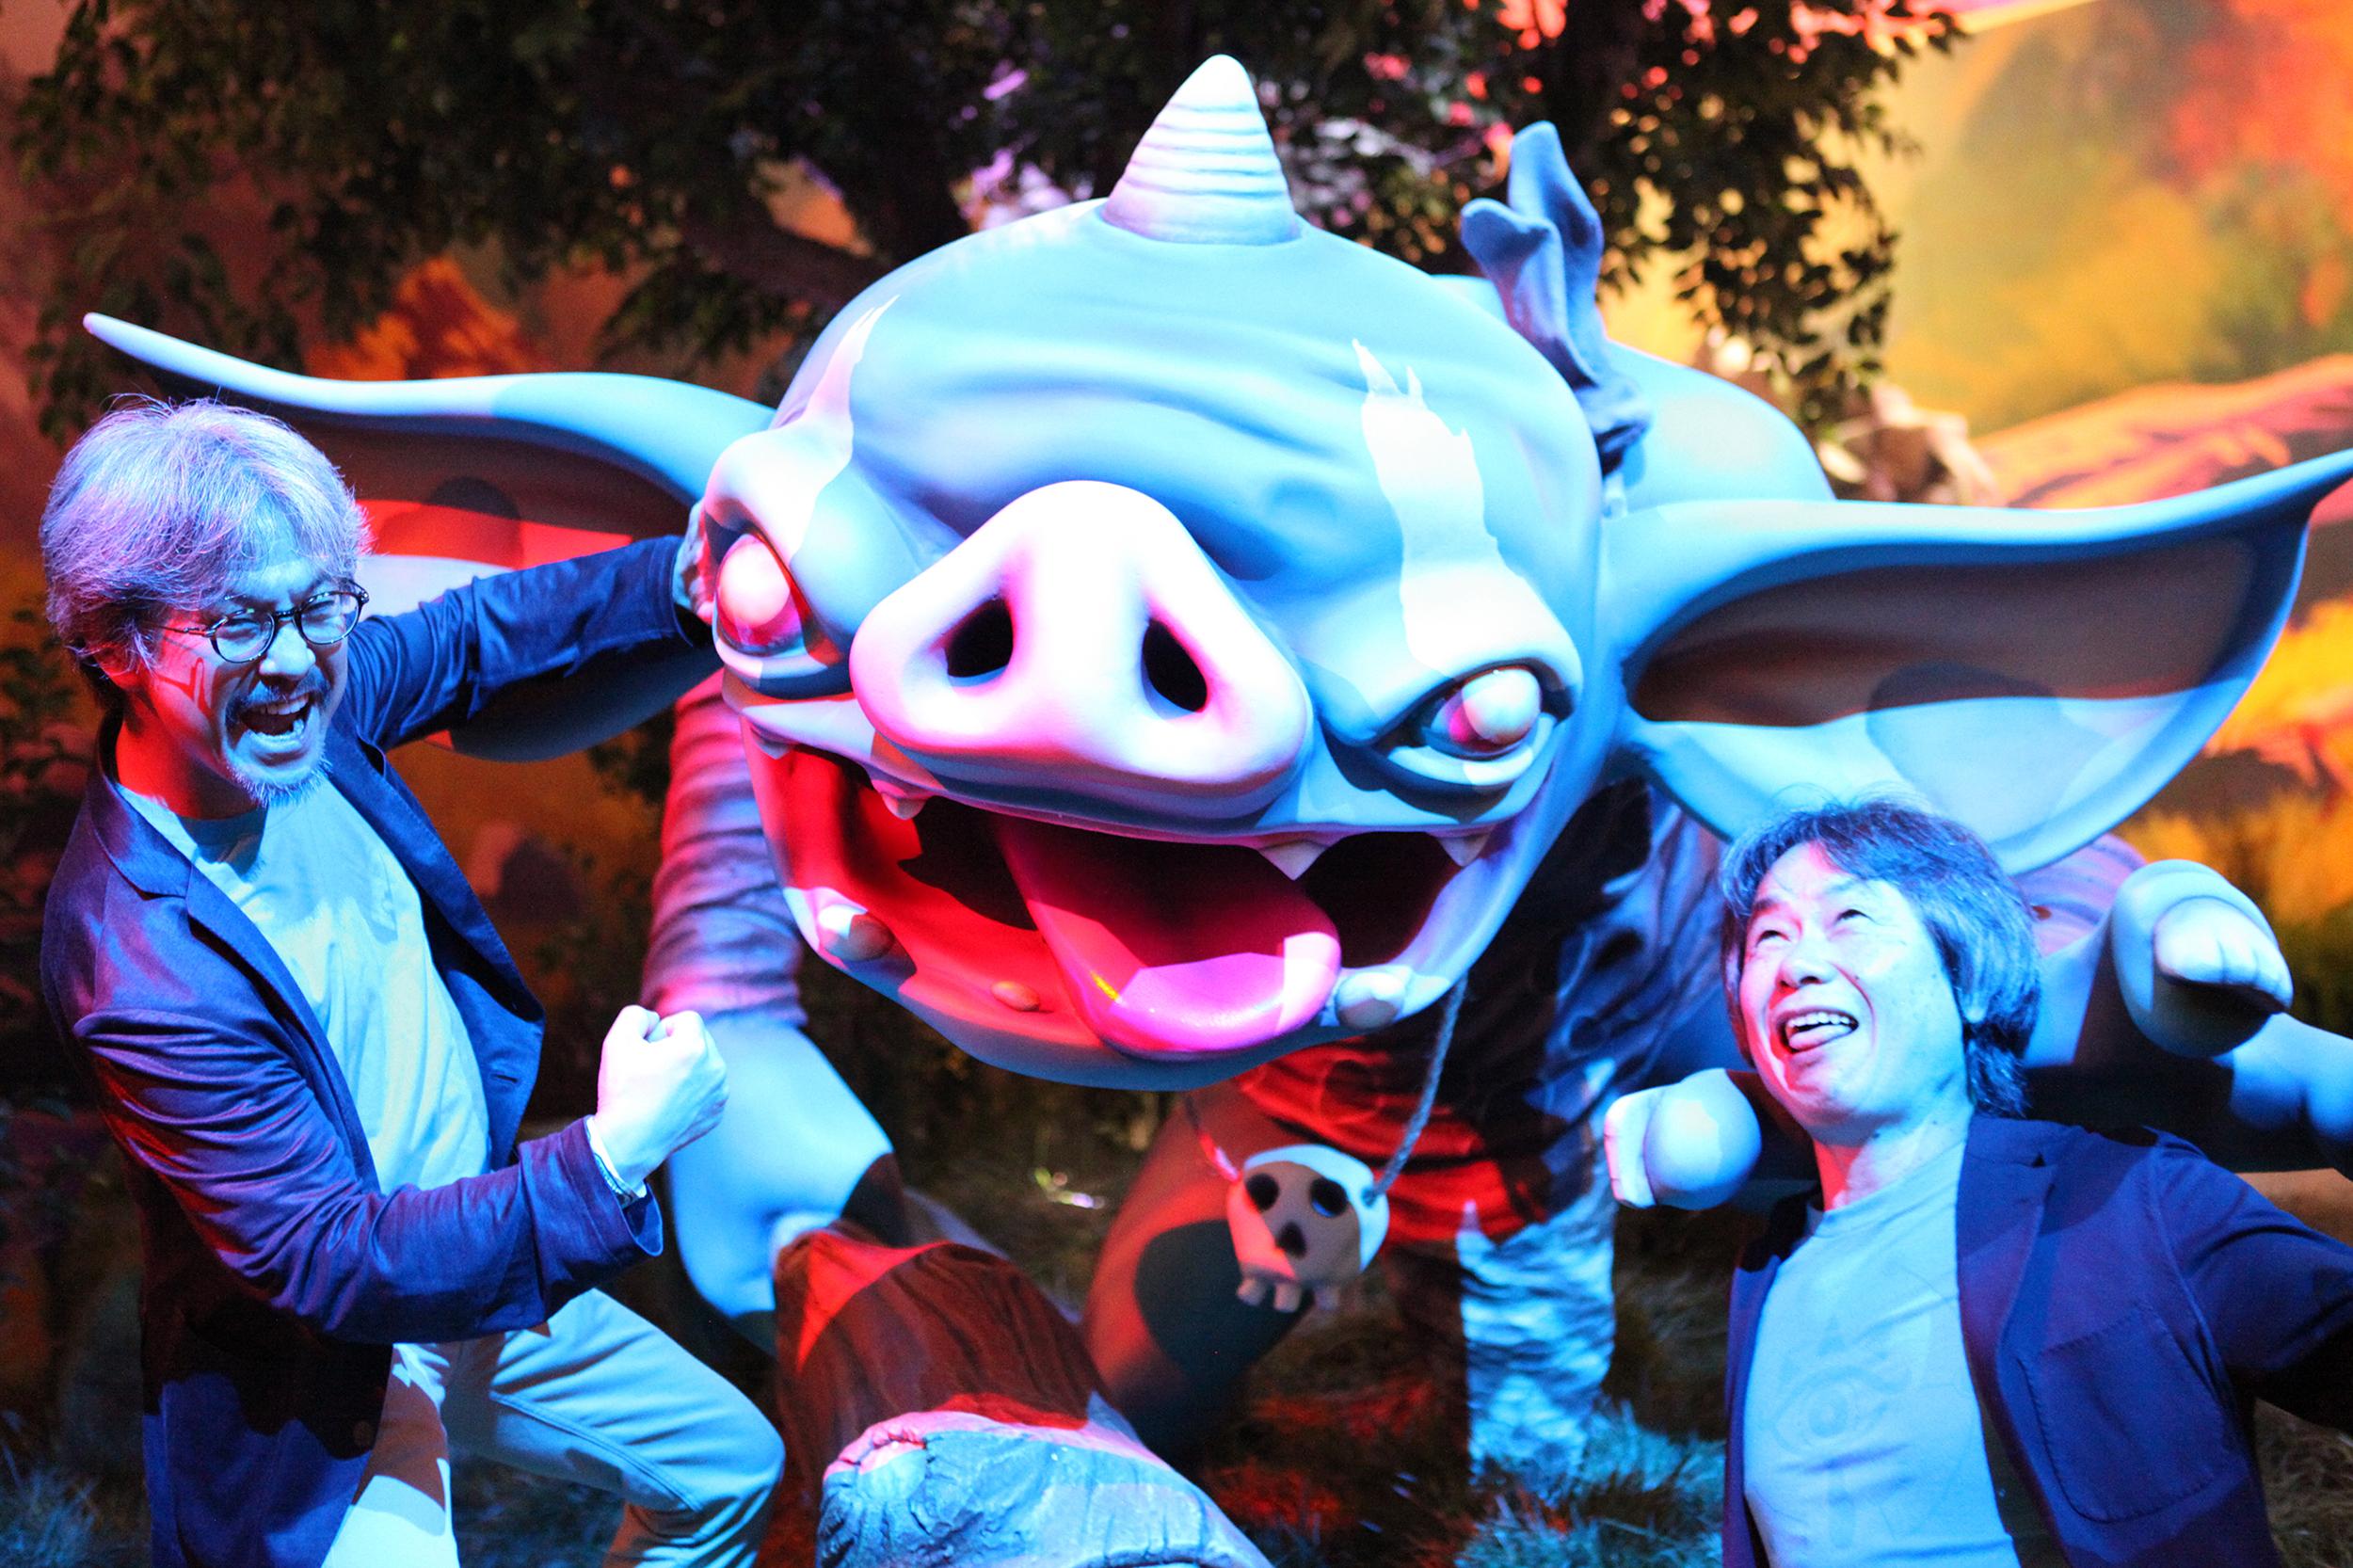 Nintendo E3 Booth Aonuma and Miyamoto